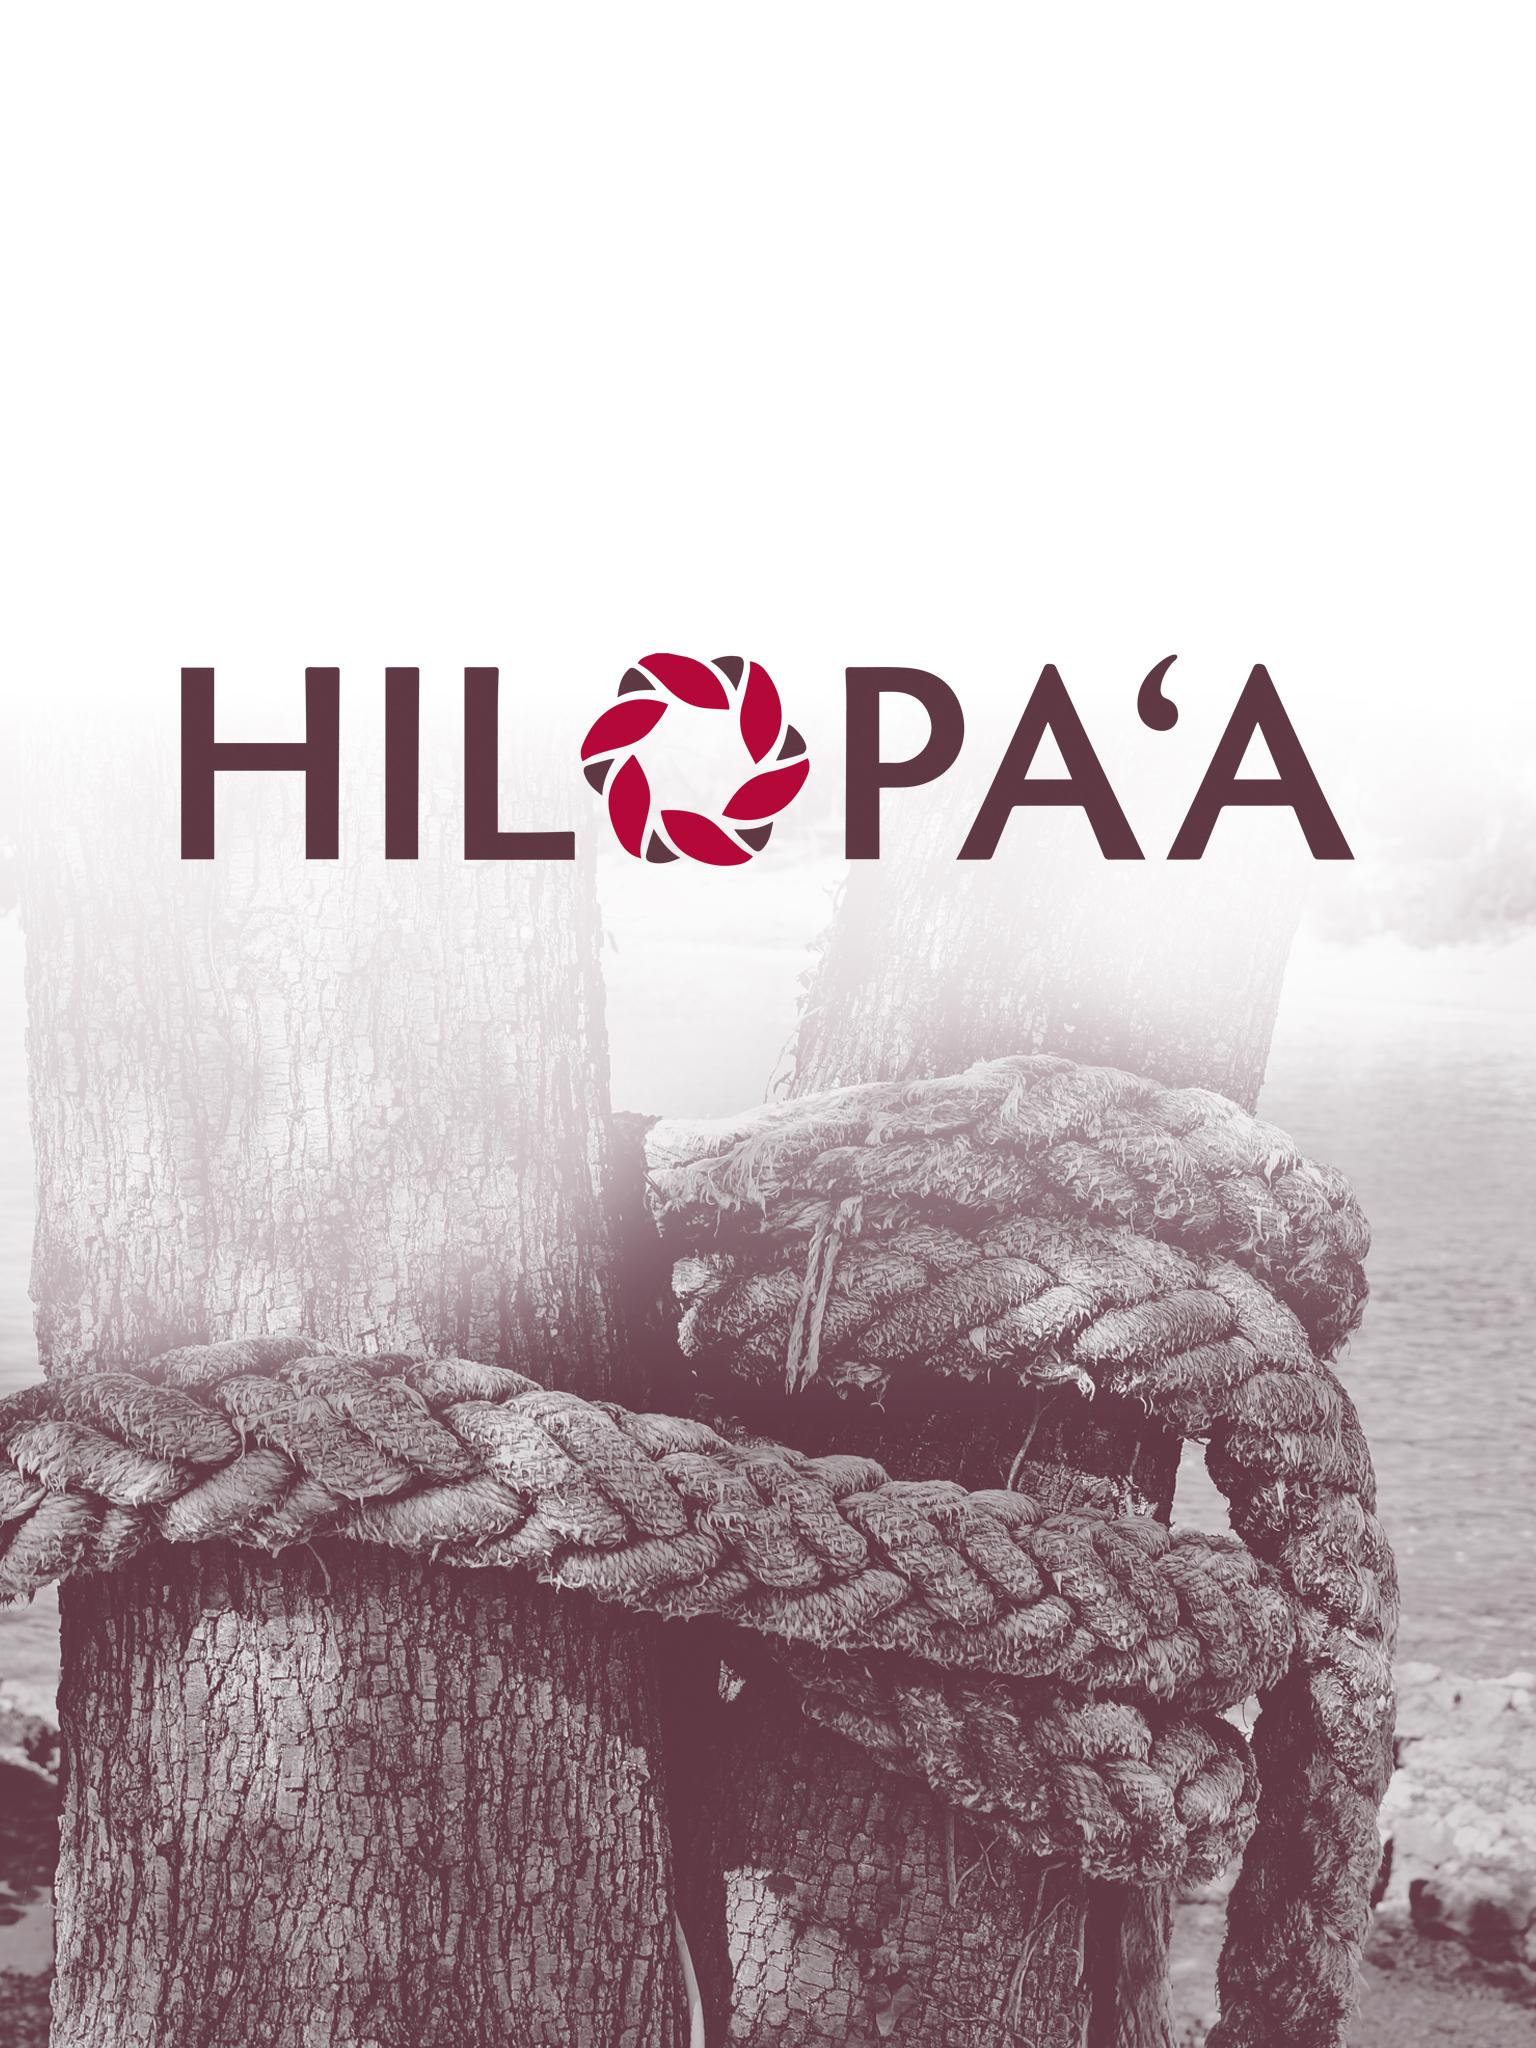 Hilopaa-splash-portrait-v3.jpg